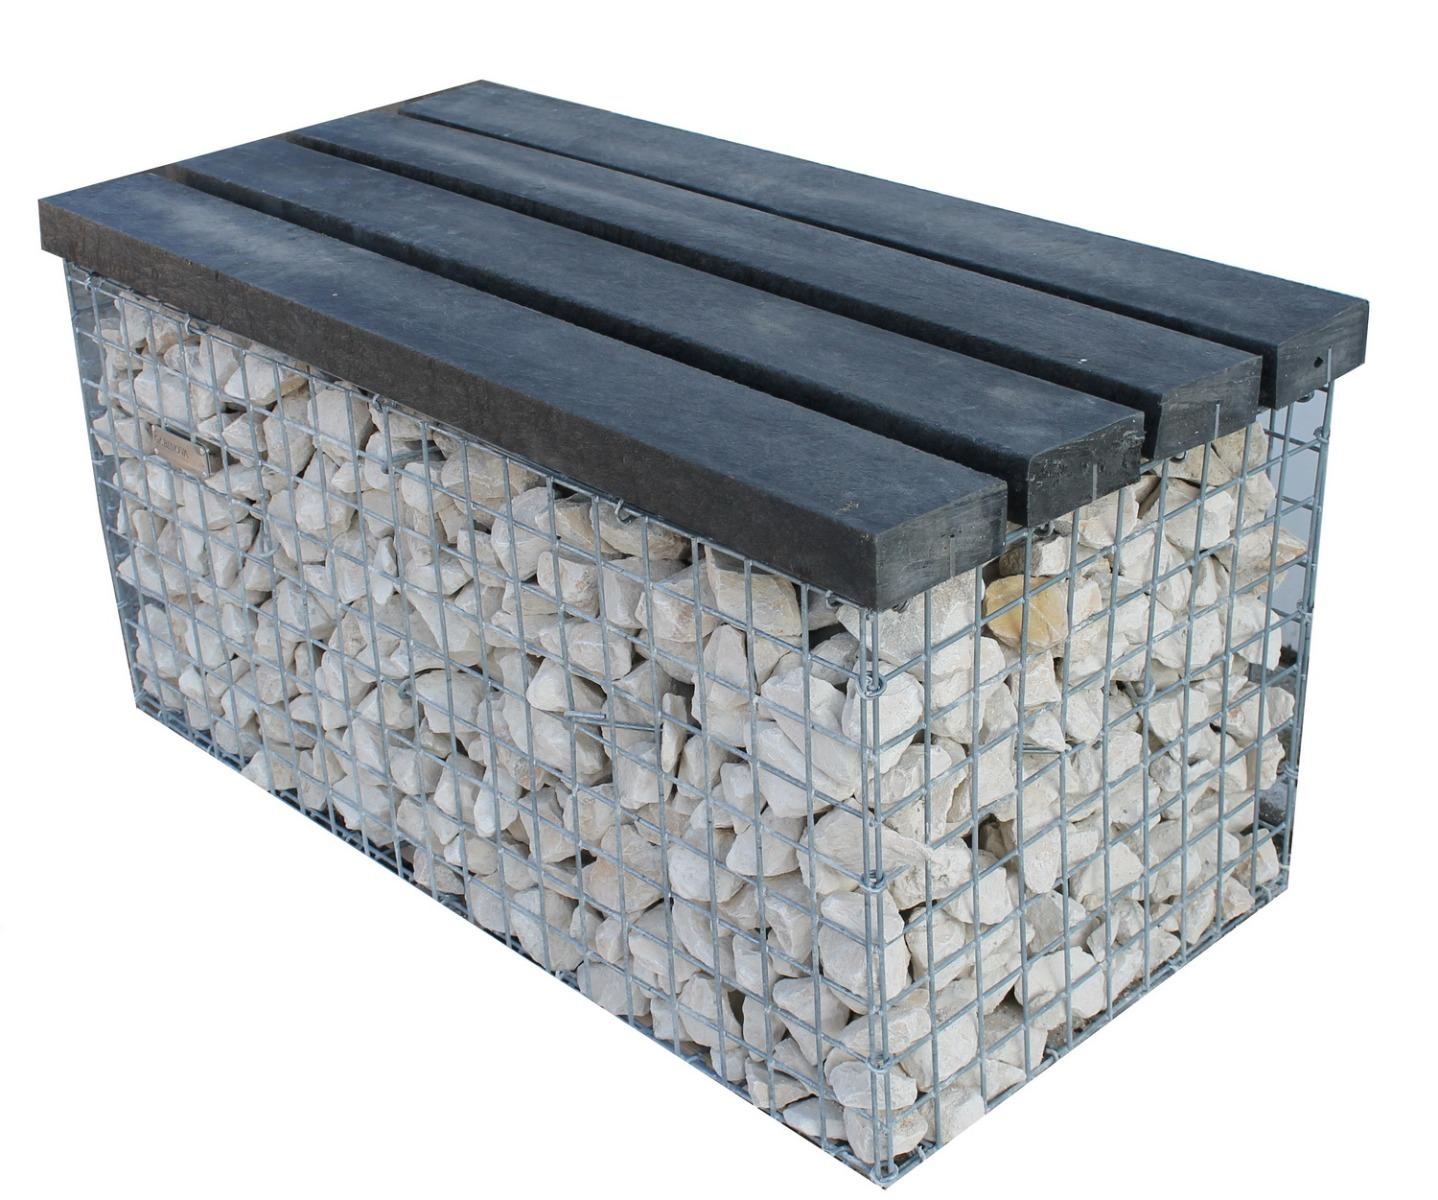 Gabion hocker Auflage Recycling-Kunststoff